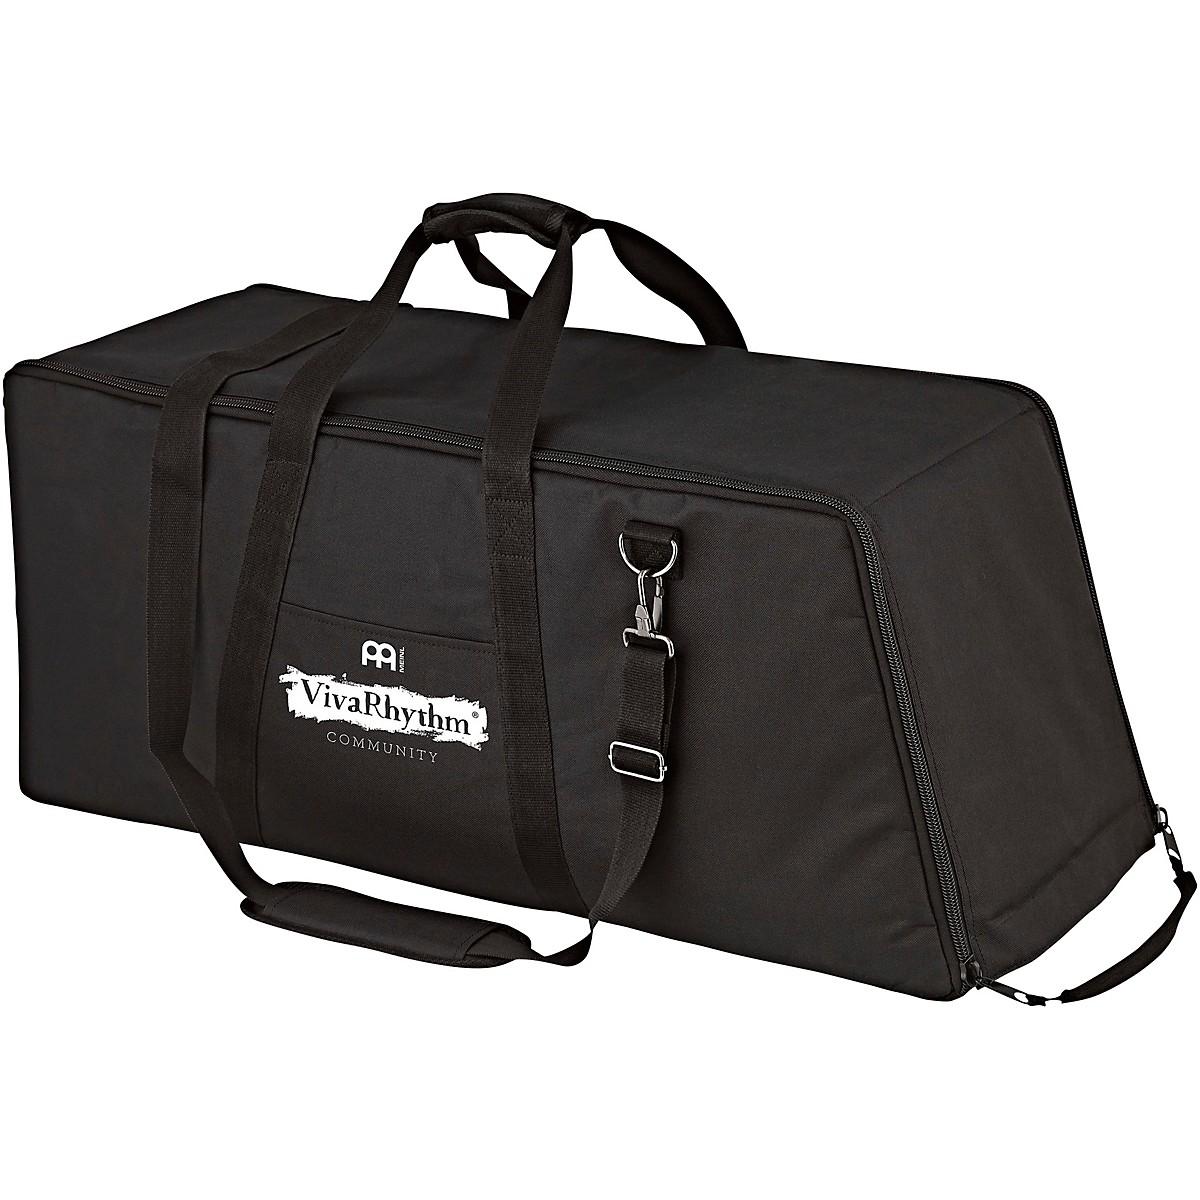 Meinl VivaRhythm caiXon/caiXoNet Standing Cajons Bag